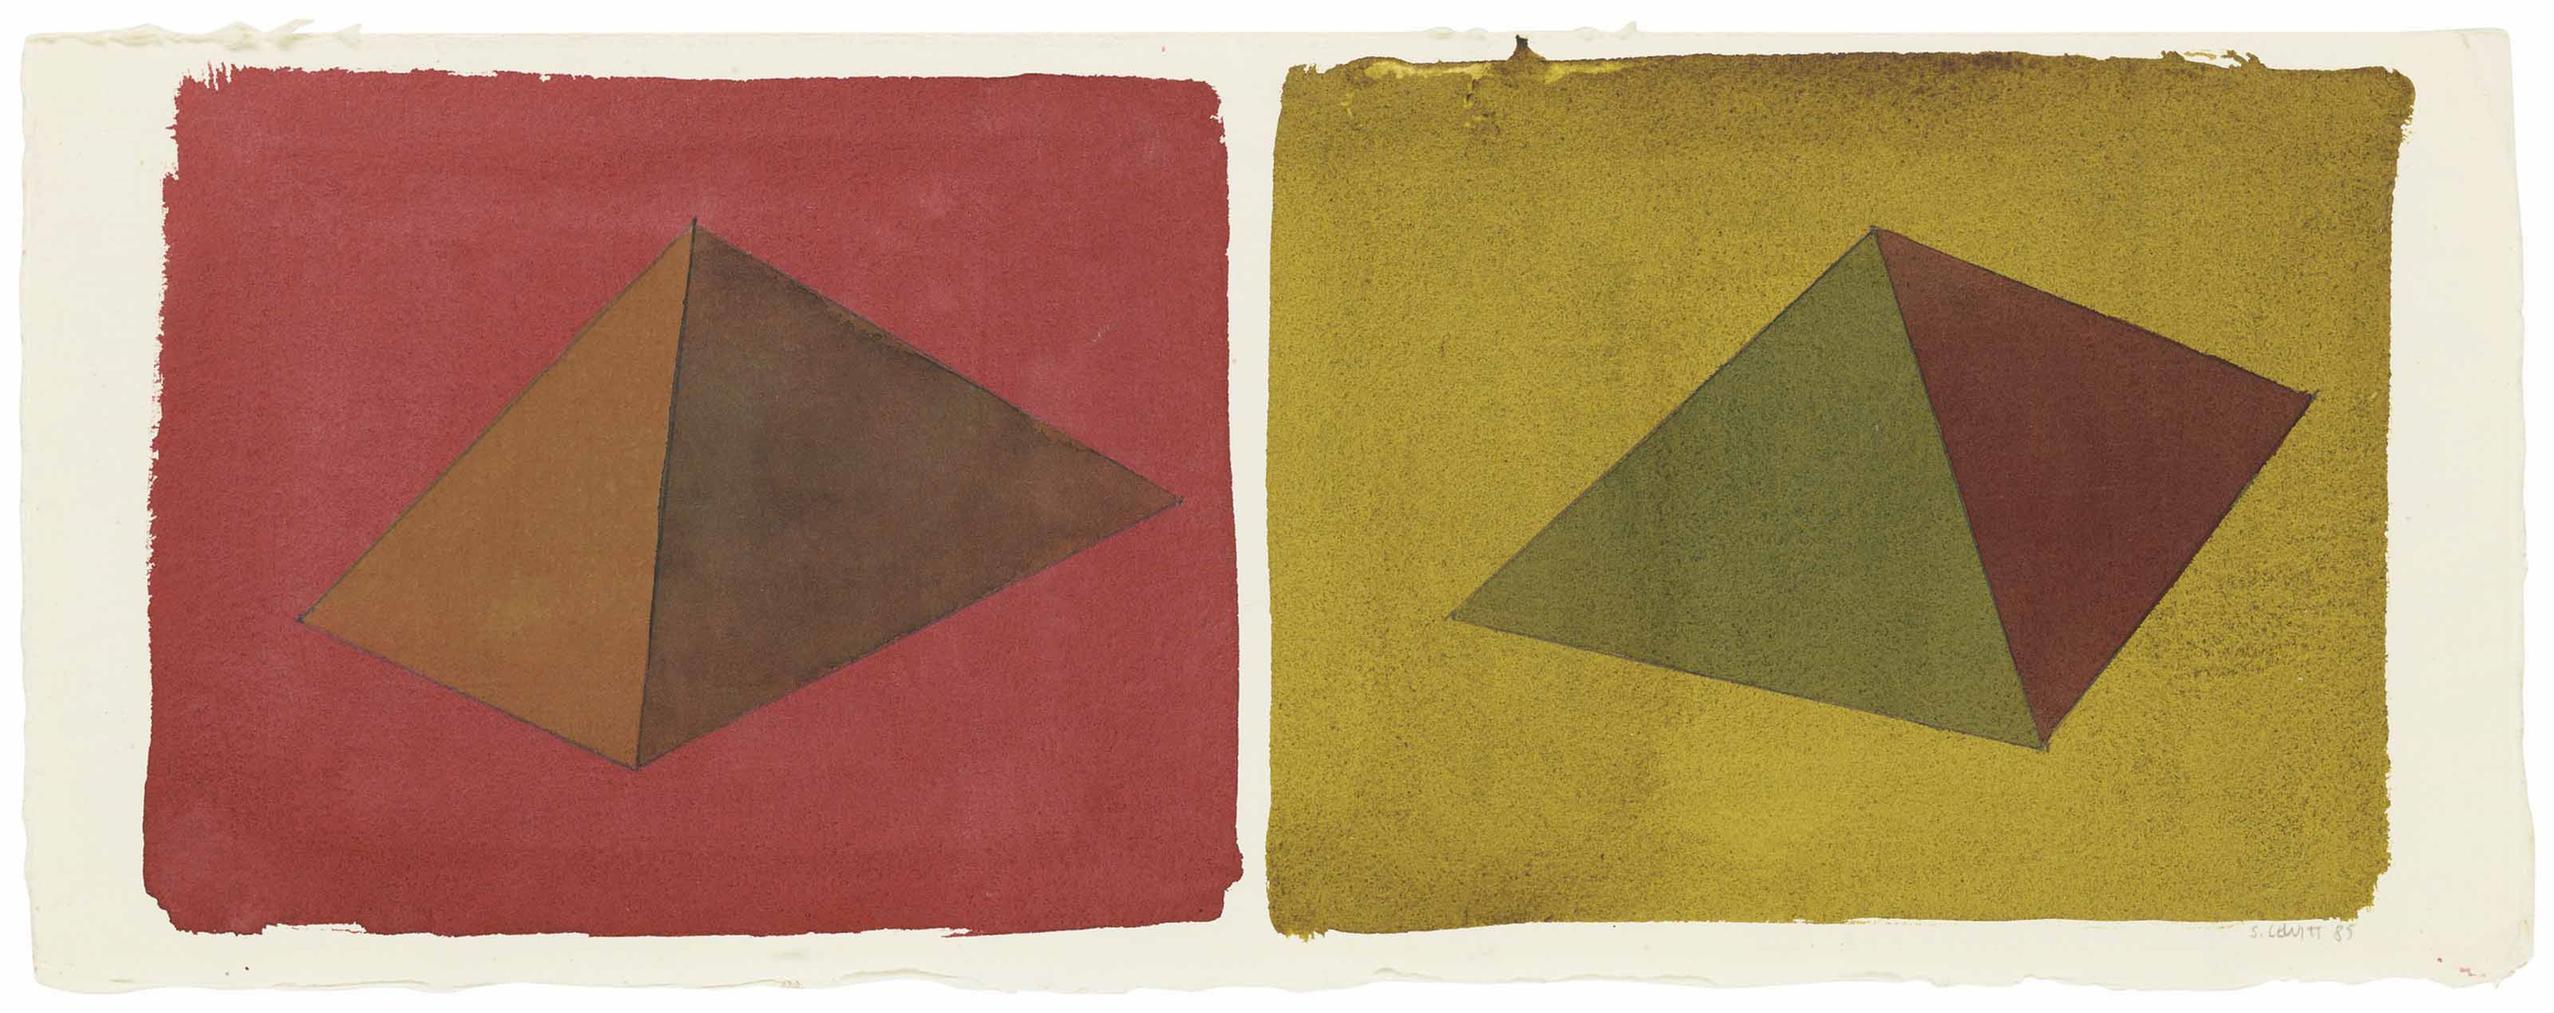 Sol LeWitt-Asymmetrical Pyramids-1985